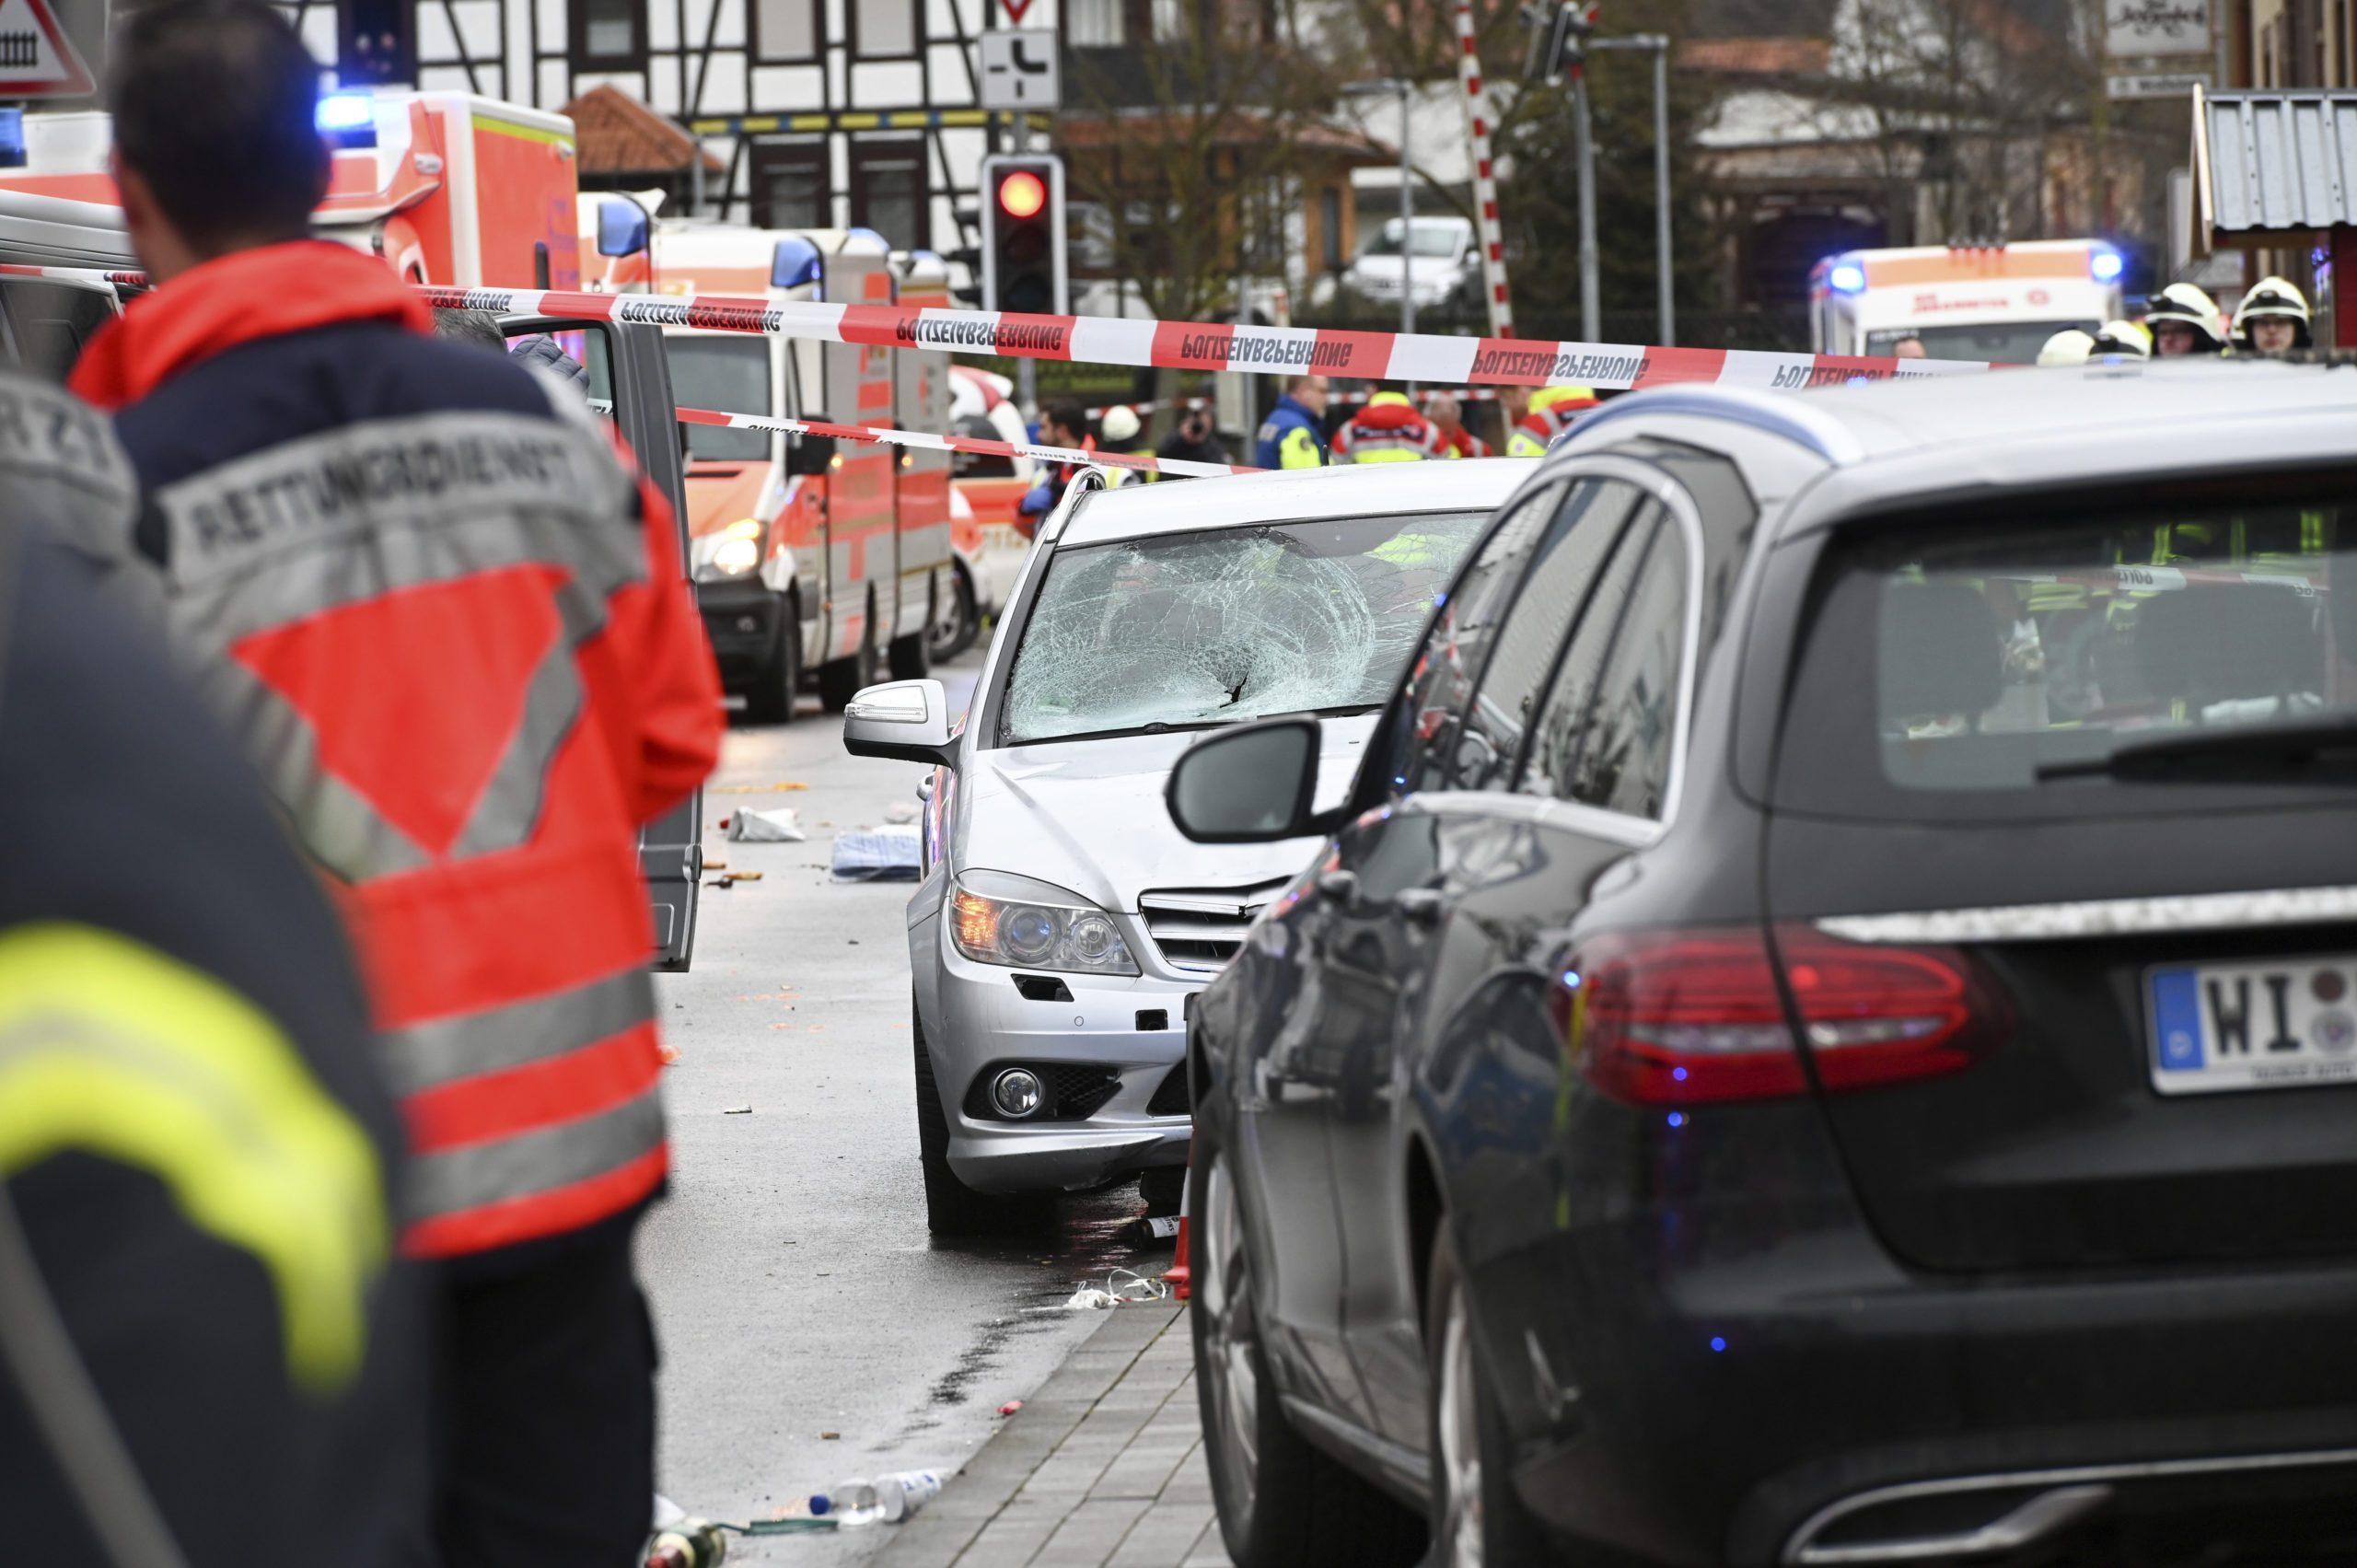 -nemacka:-autobus-sleteo-sa-puta,-tri-osobe-ozbiljno-povredjene